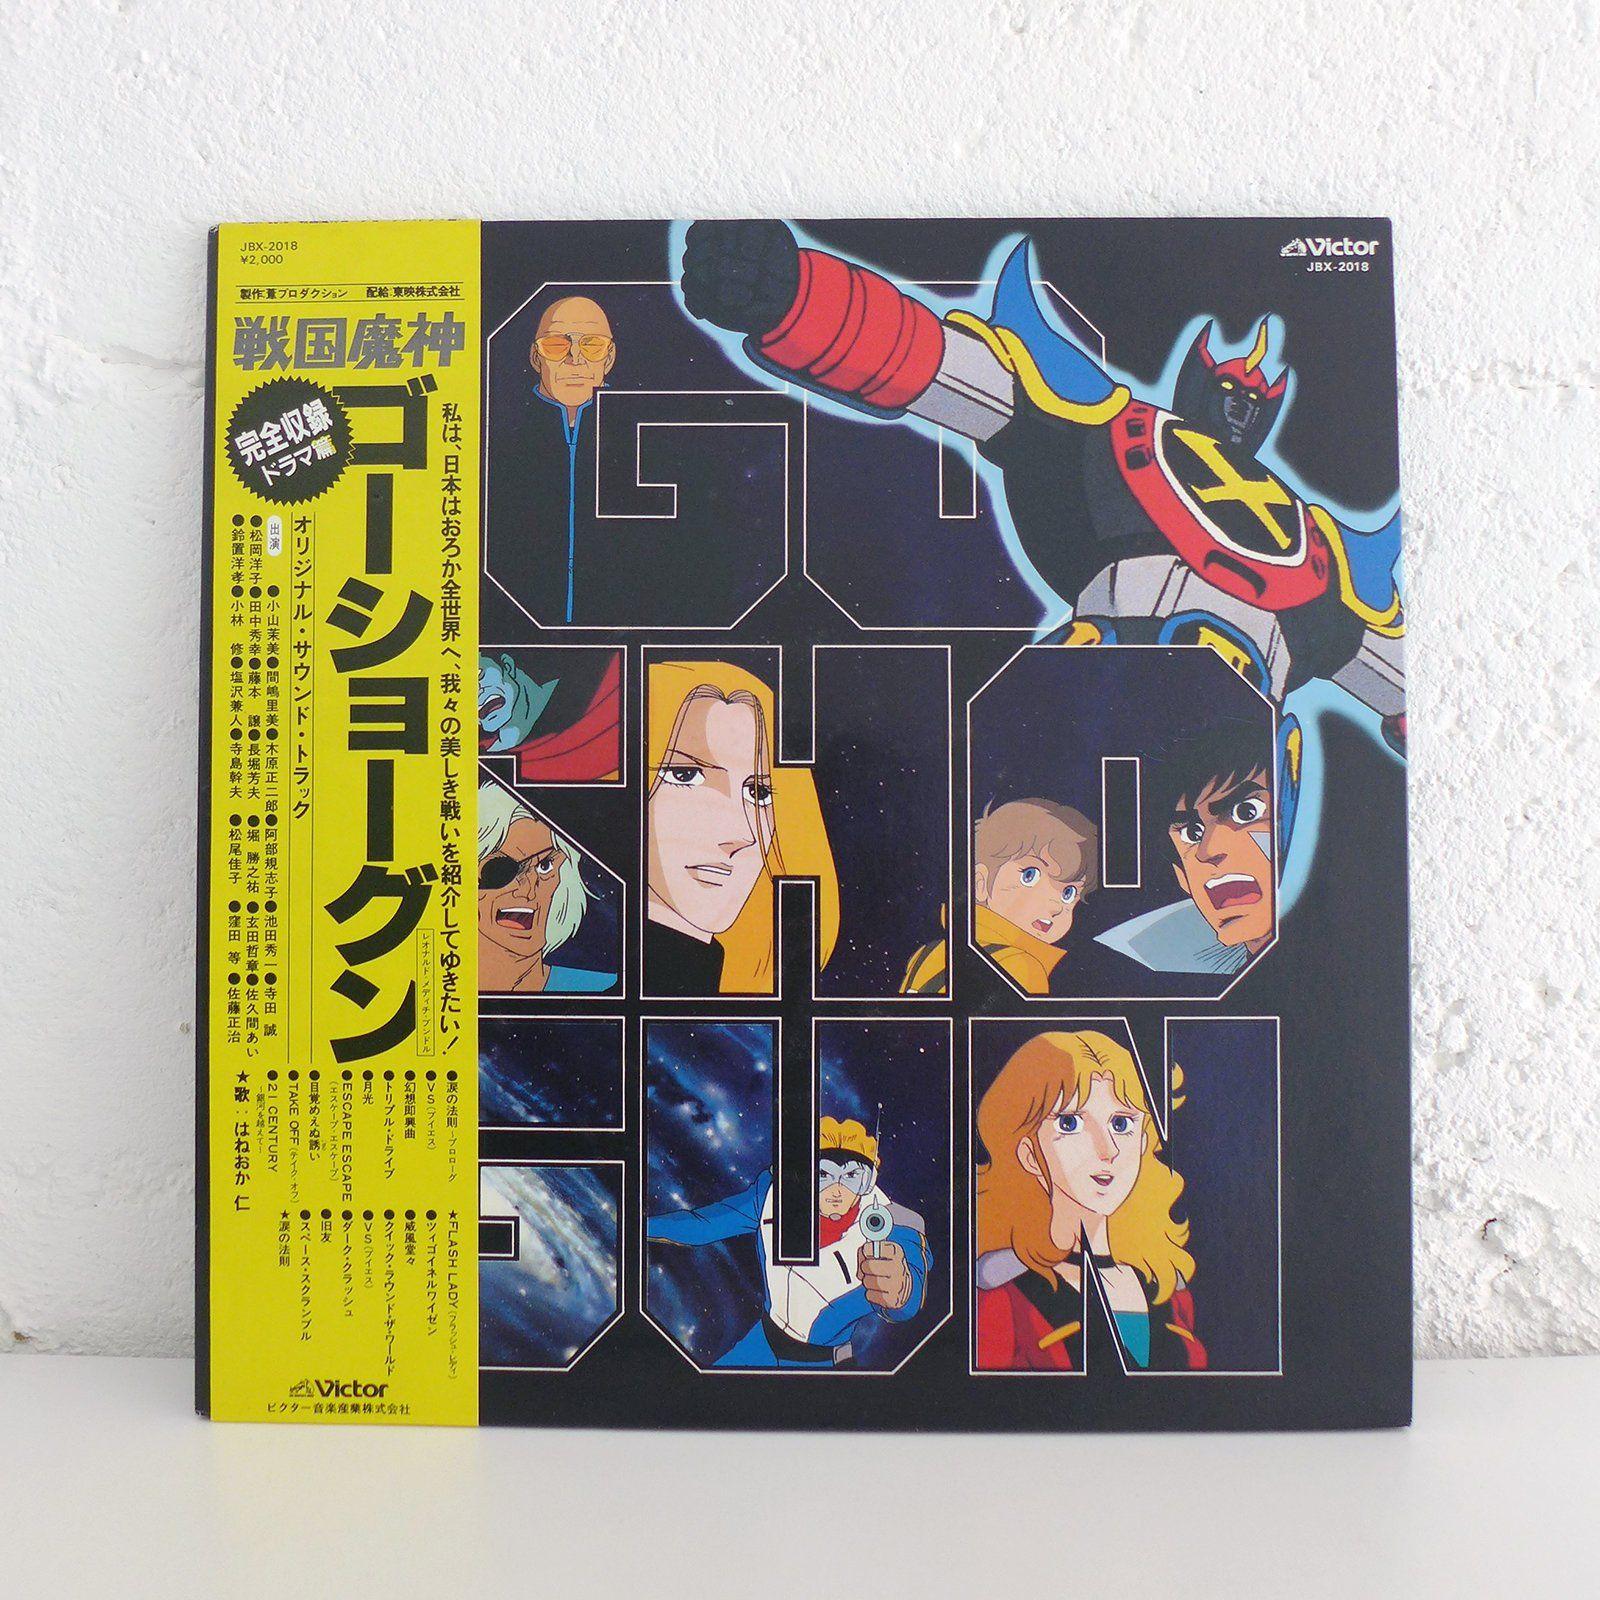 Anime Goshogun Drama Edition Vintage Vinyl Record 12 Lp Album In 2020 Vintage Vinyl Records Lp Albums Anime Mobile